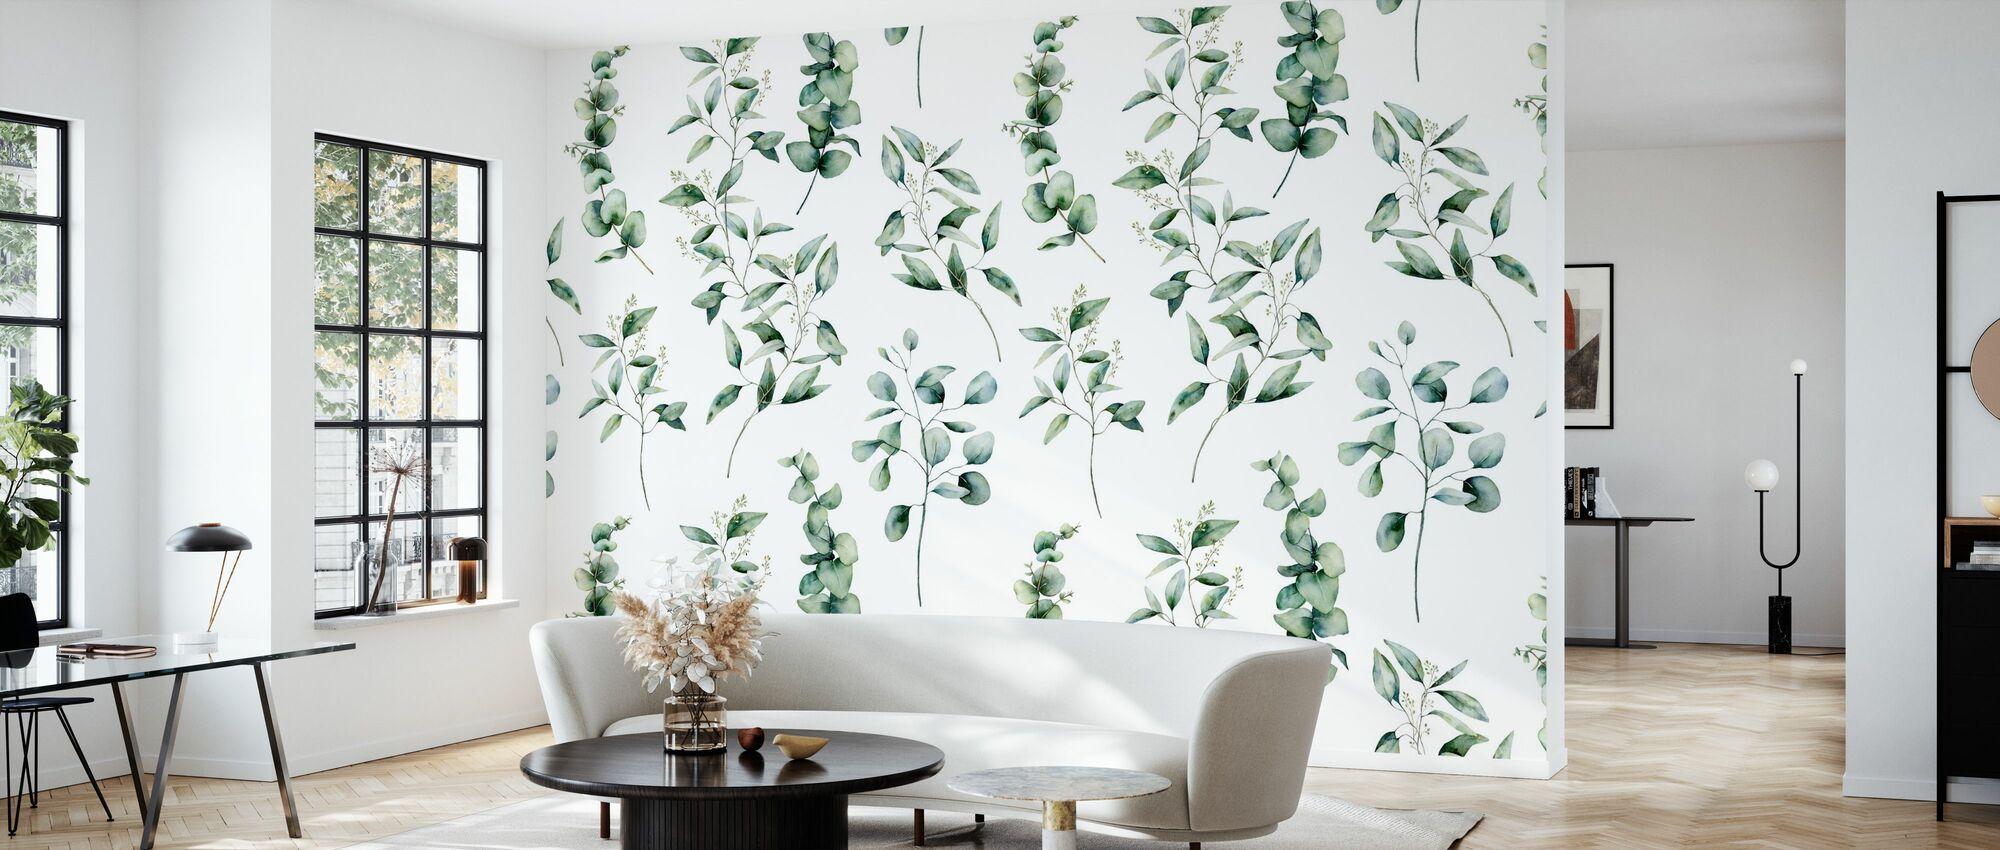 Eucalyptus - Wallpaper - Living Room